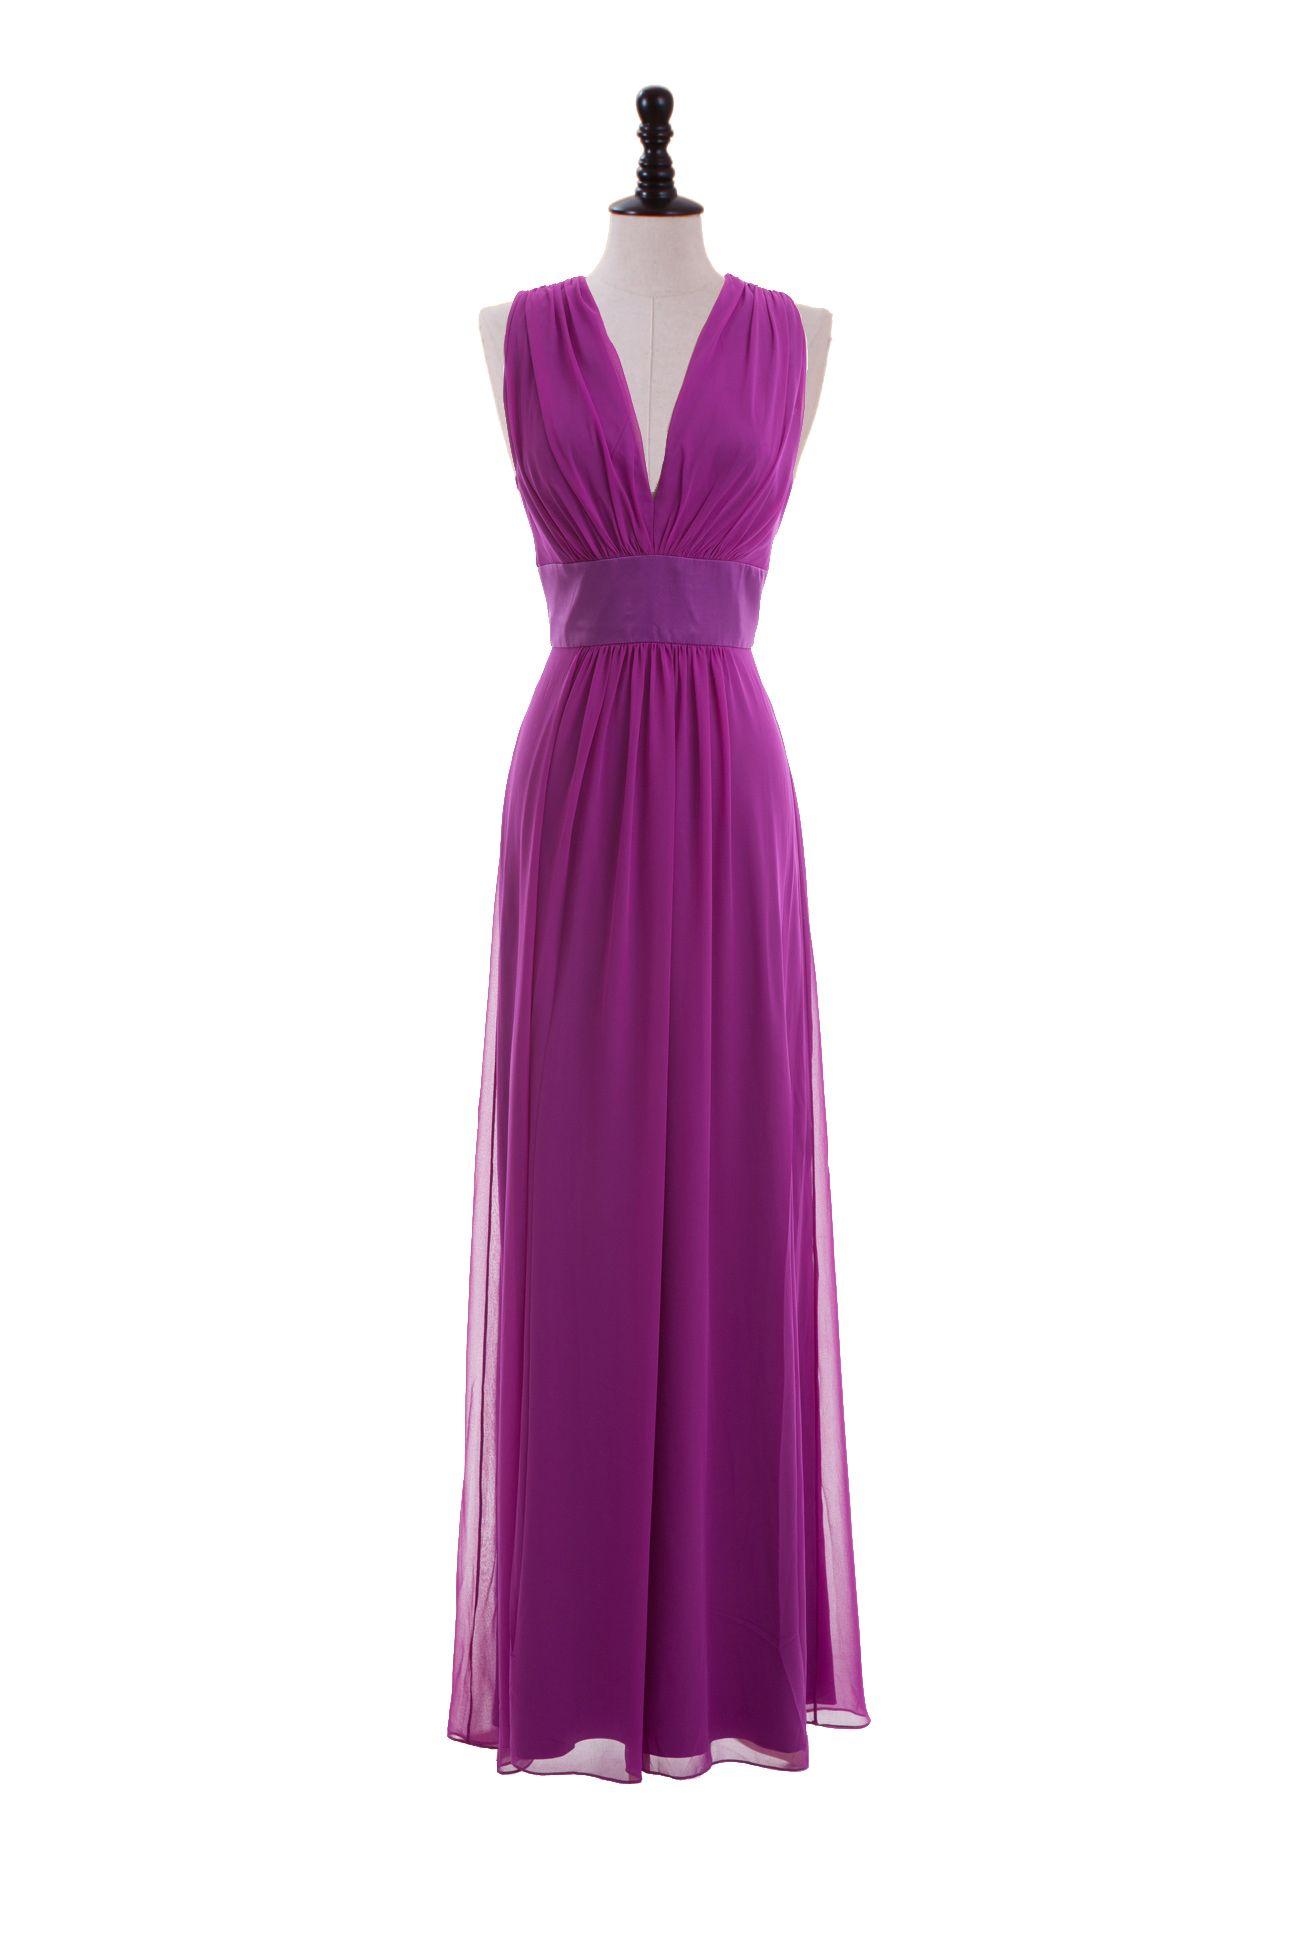 V-Neck Chiffon Dress with Inset Waistband | Mode | Pinterest | Traje ...